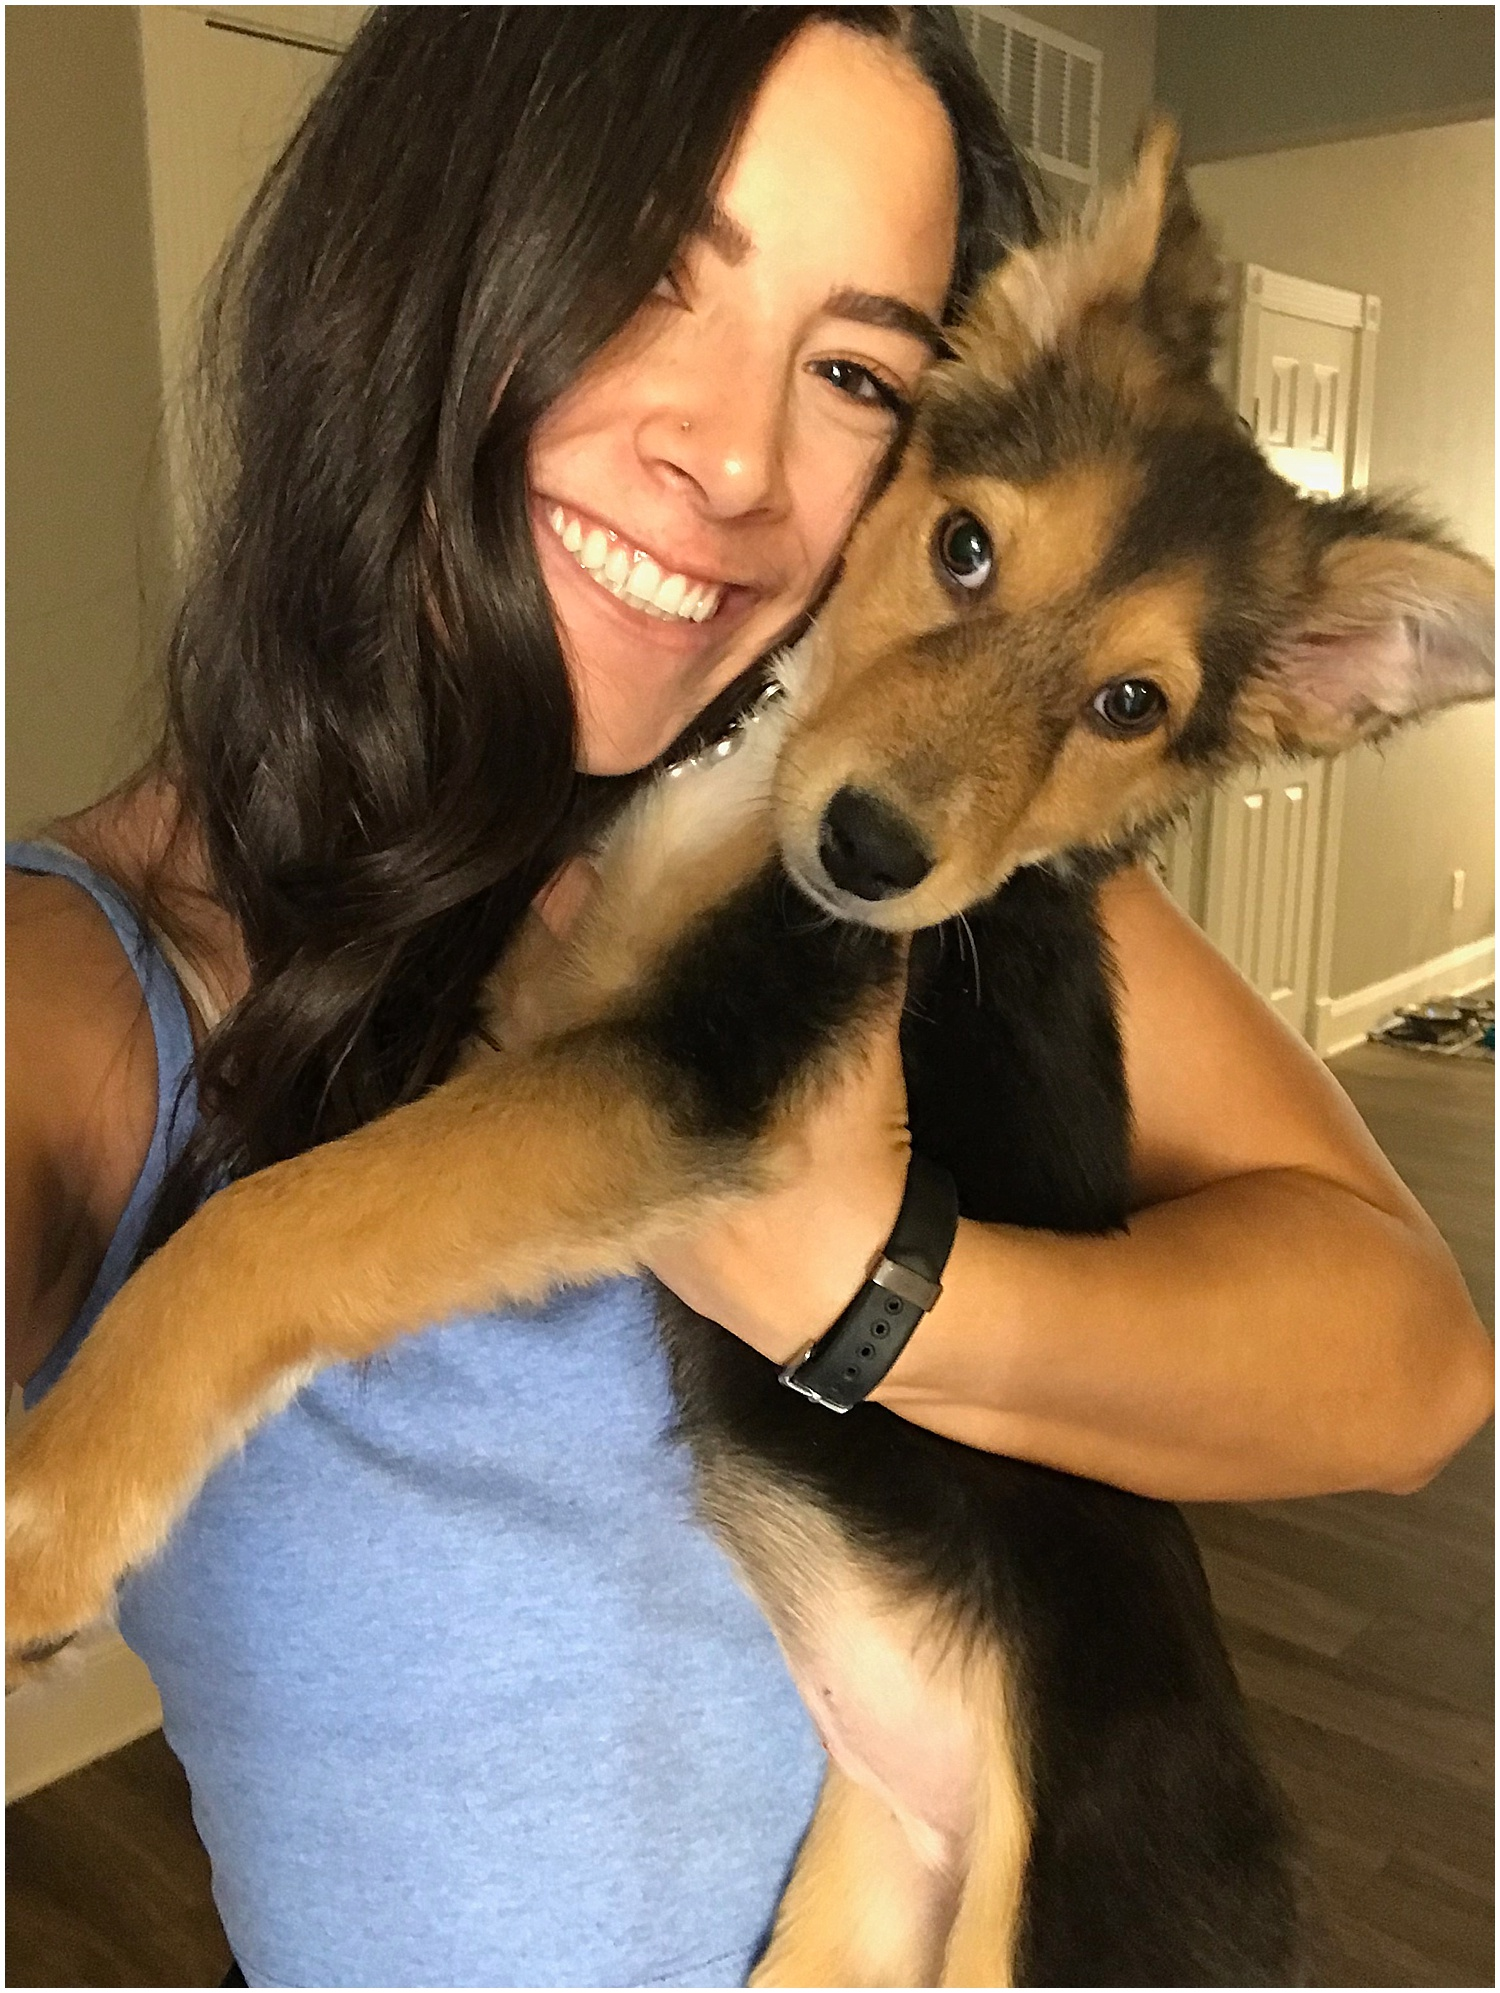 met his cute doggo Luna